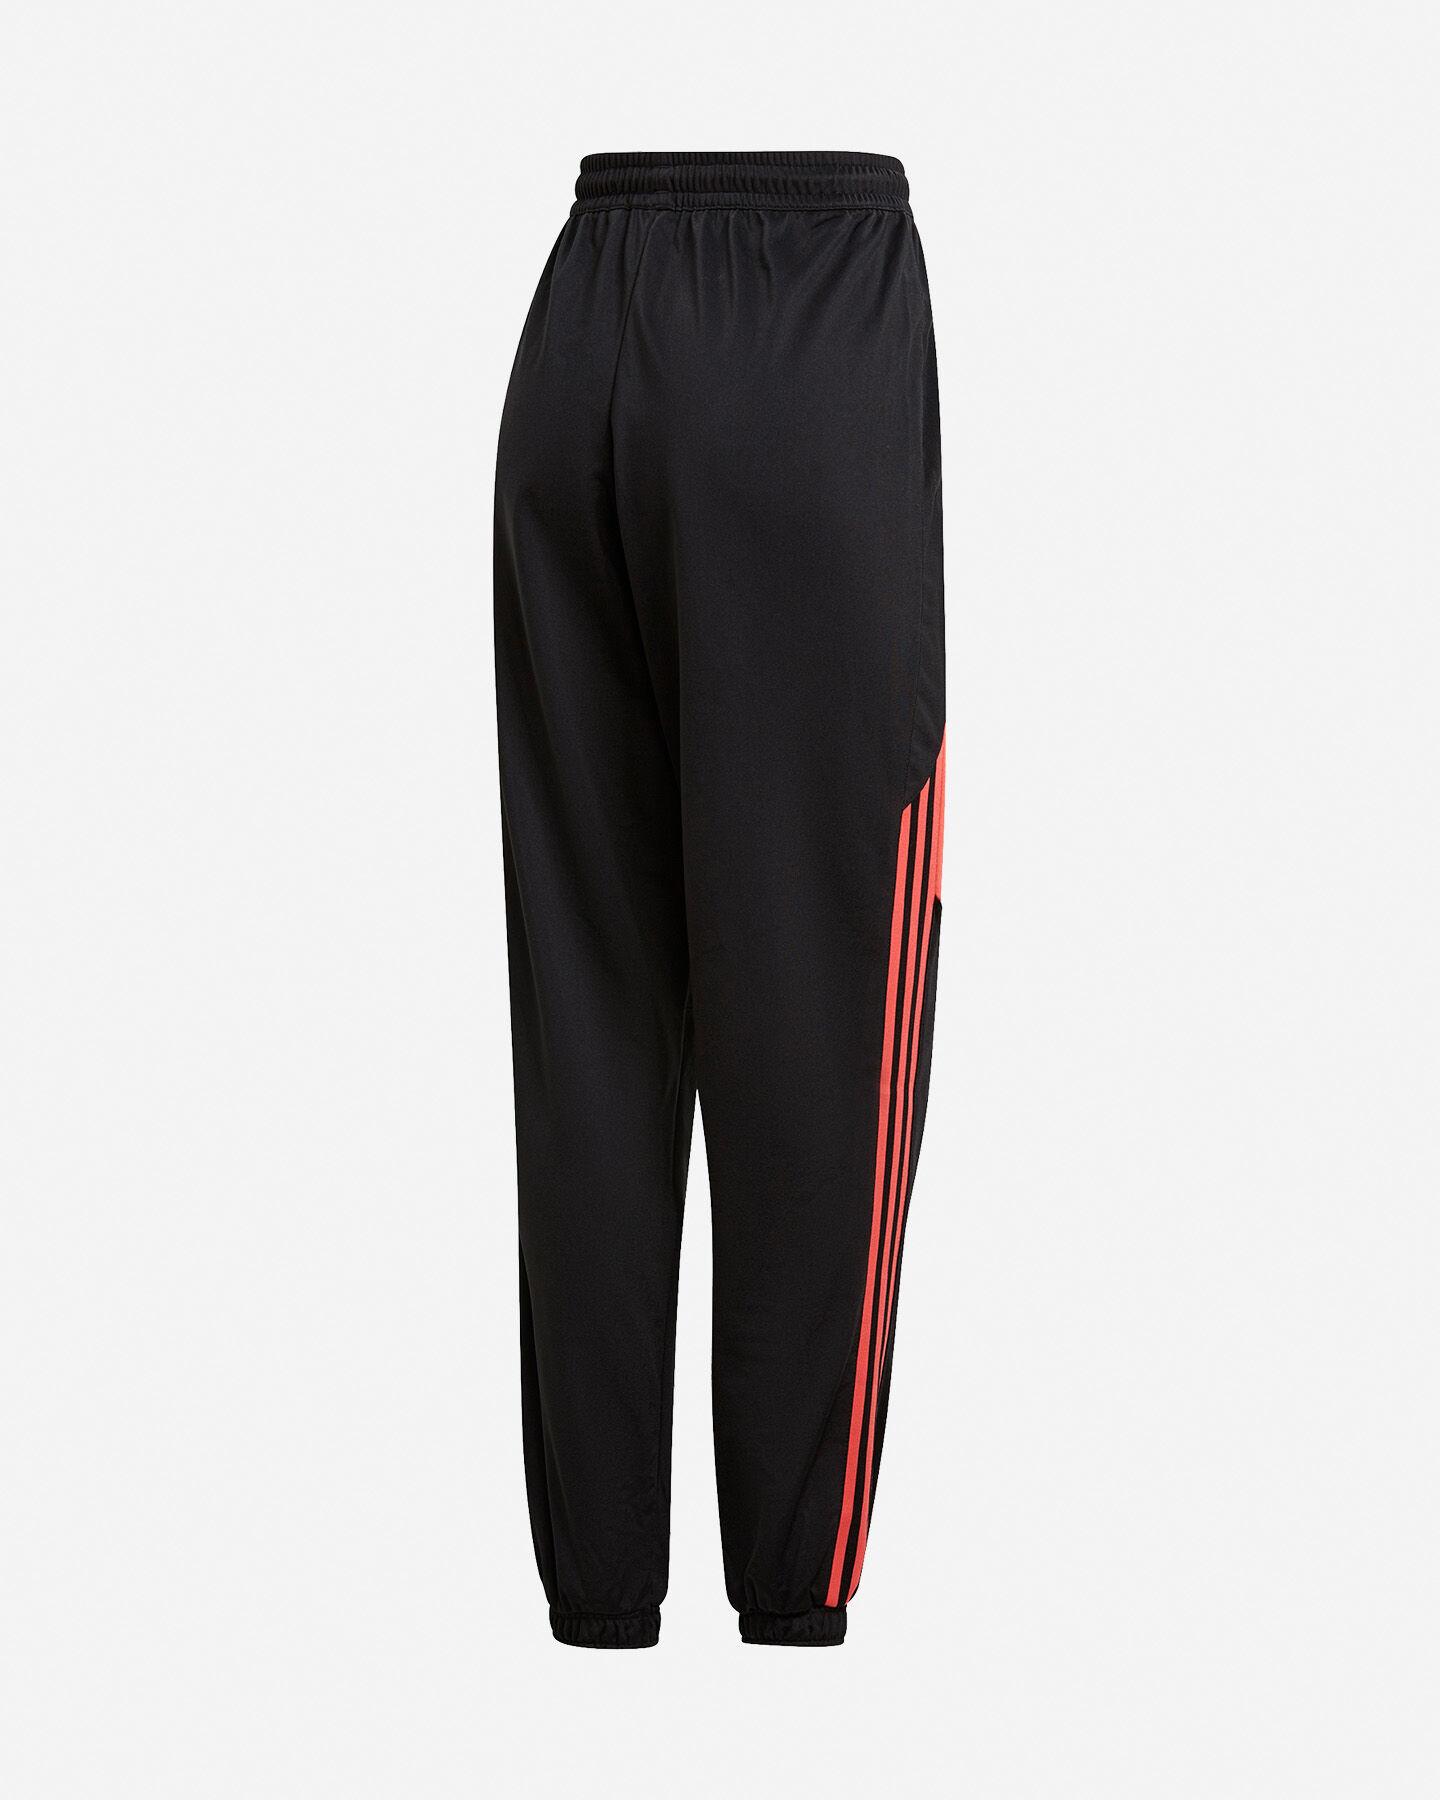 Pantalone ADIDAS ORIGINALS TRACK W S5209953 scatto 1